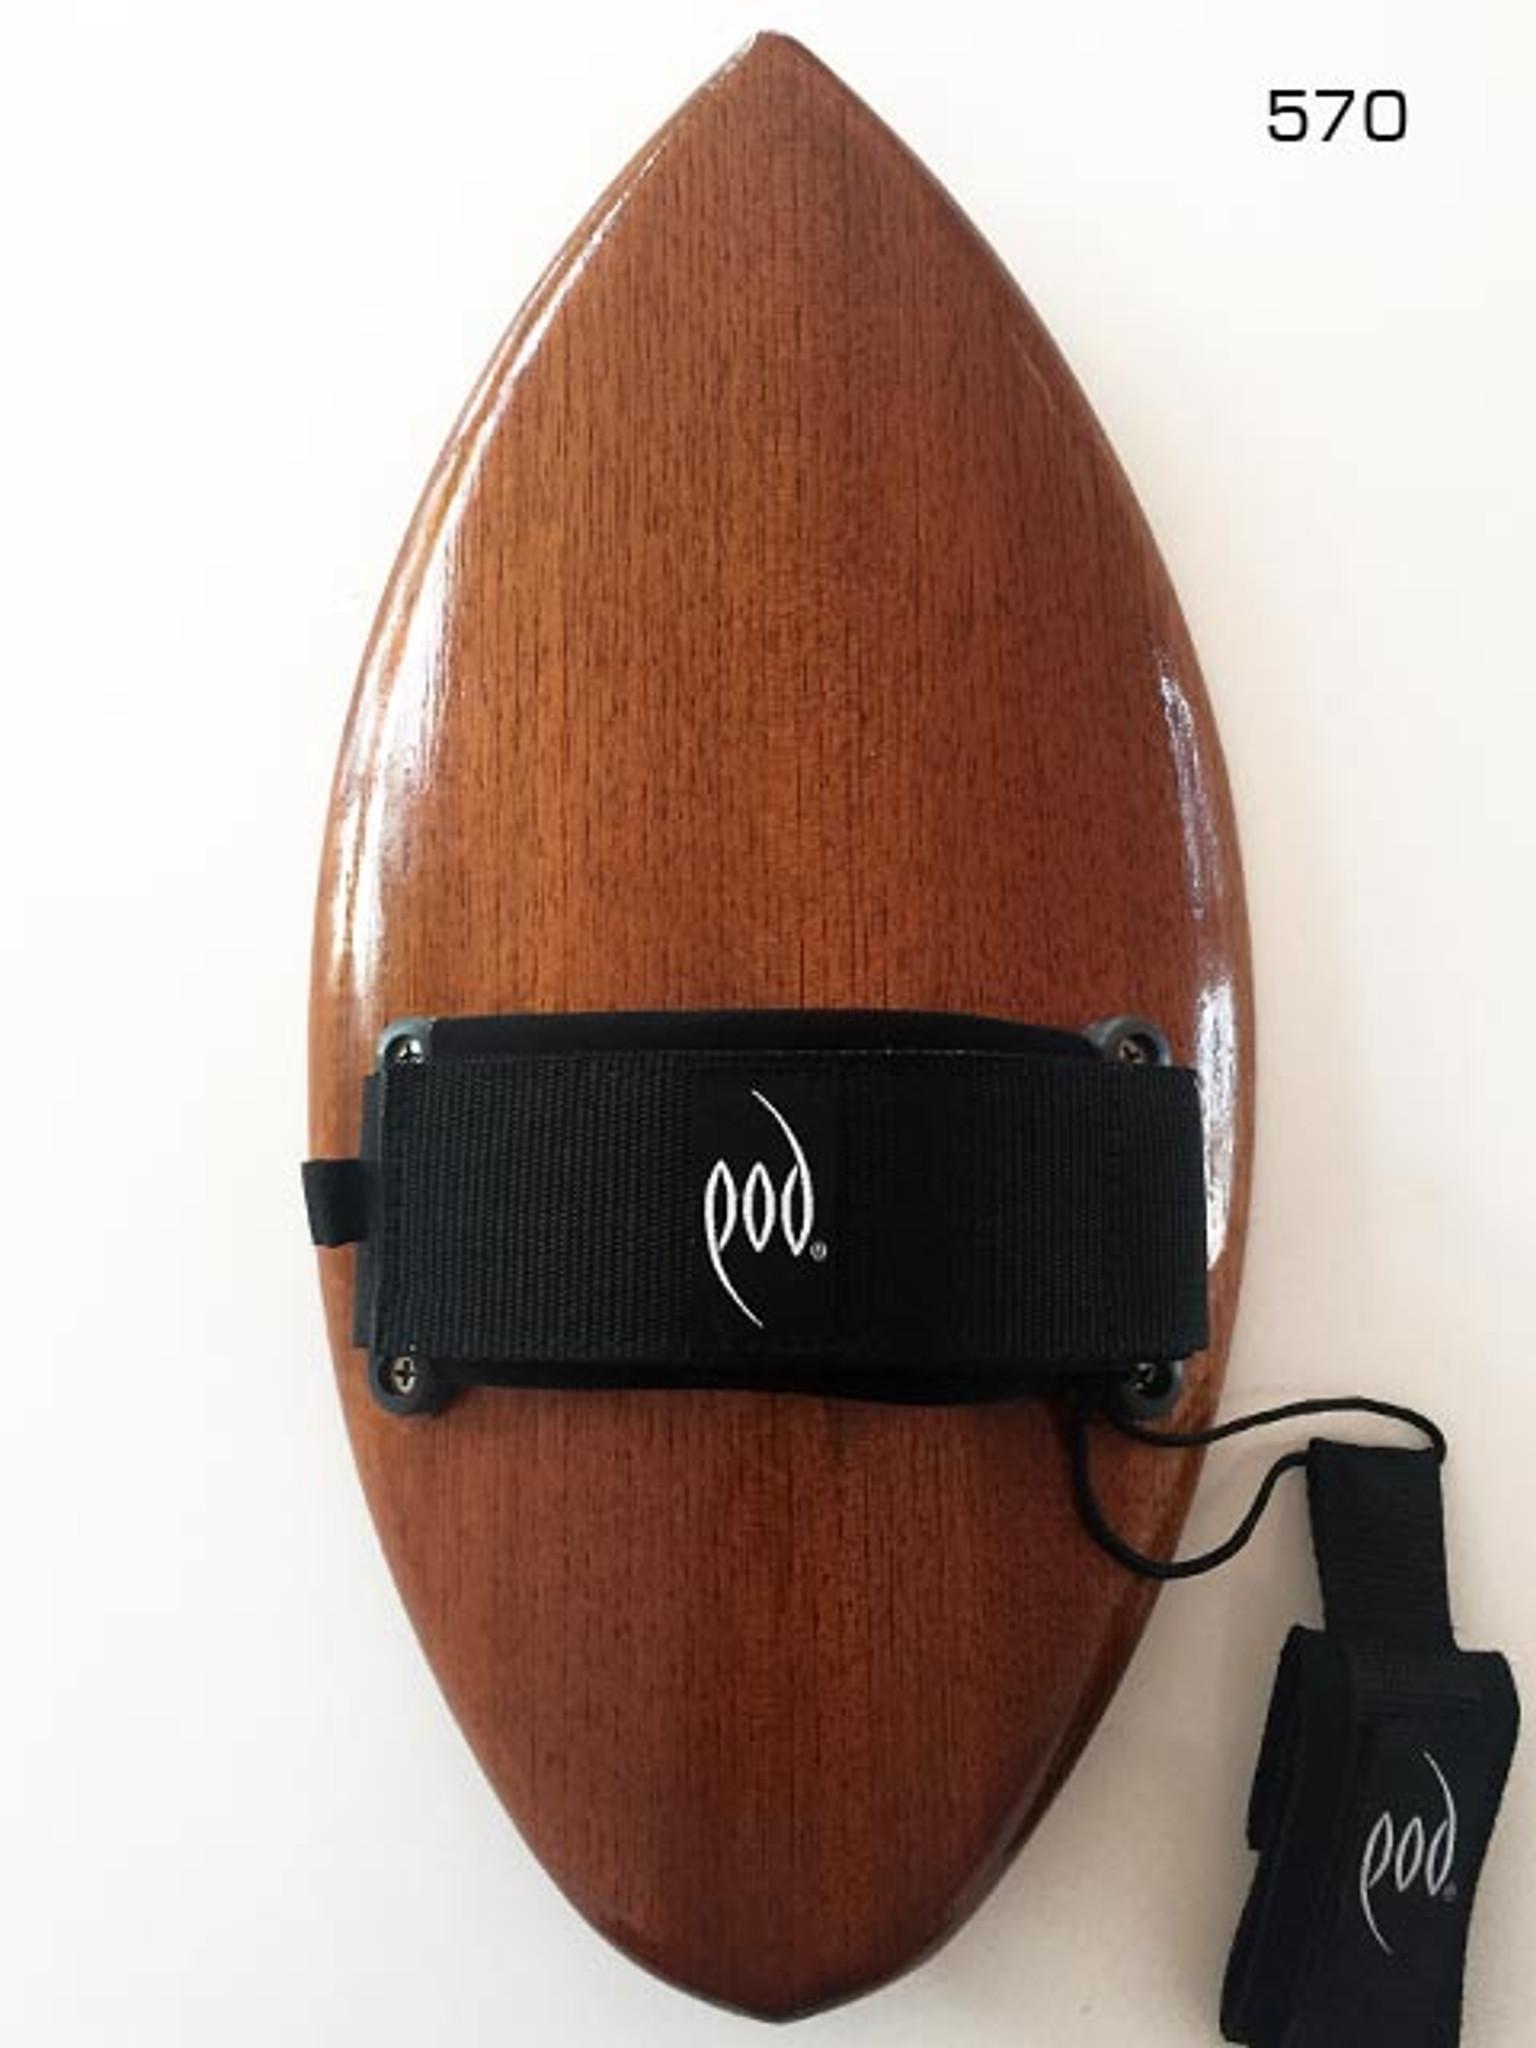 Original Handcrafted POD Handboard - Bodysurfing Handplanes